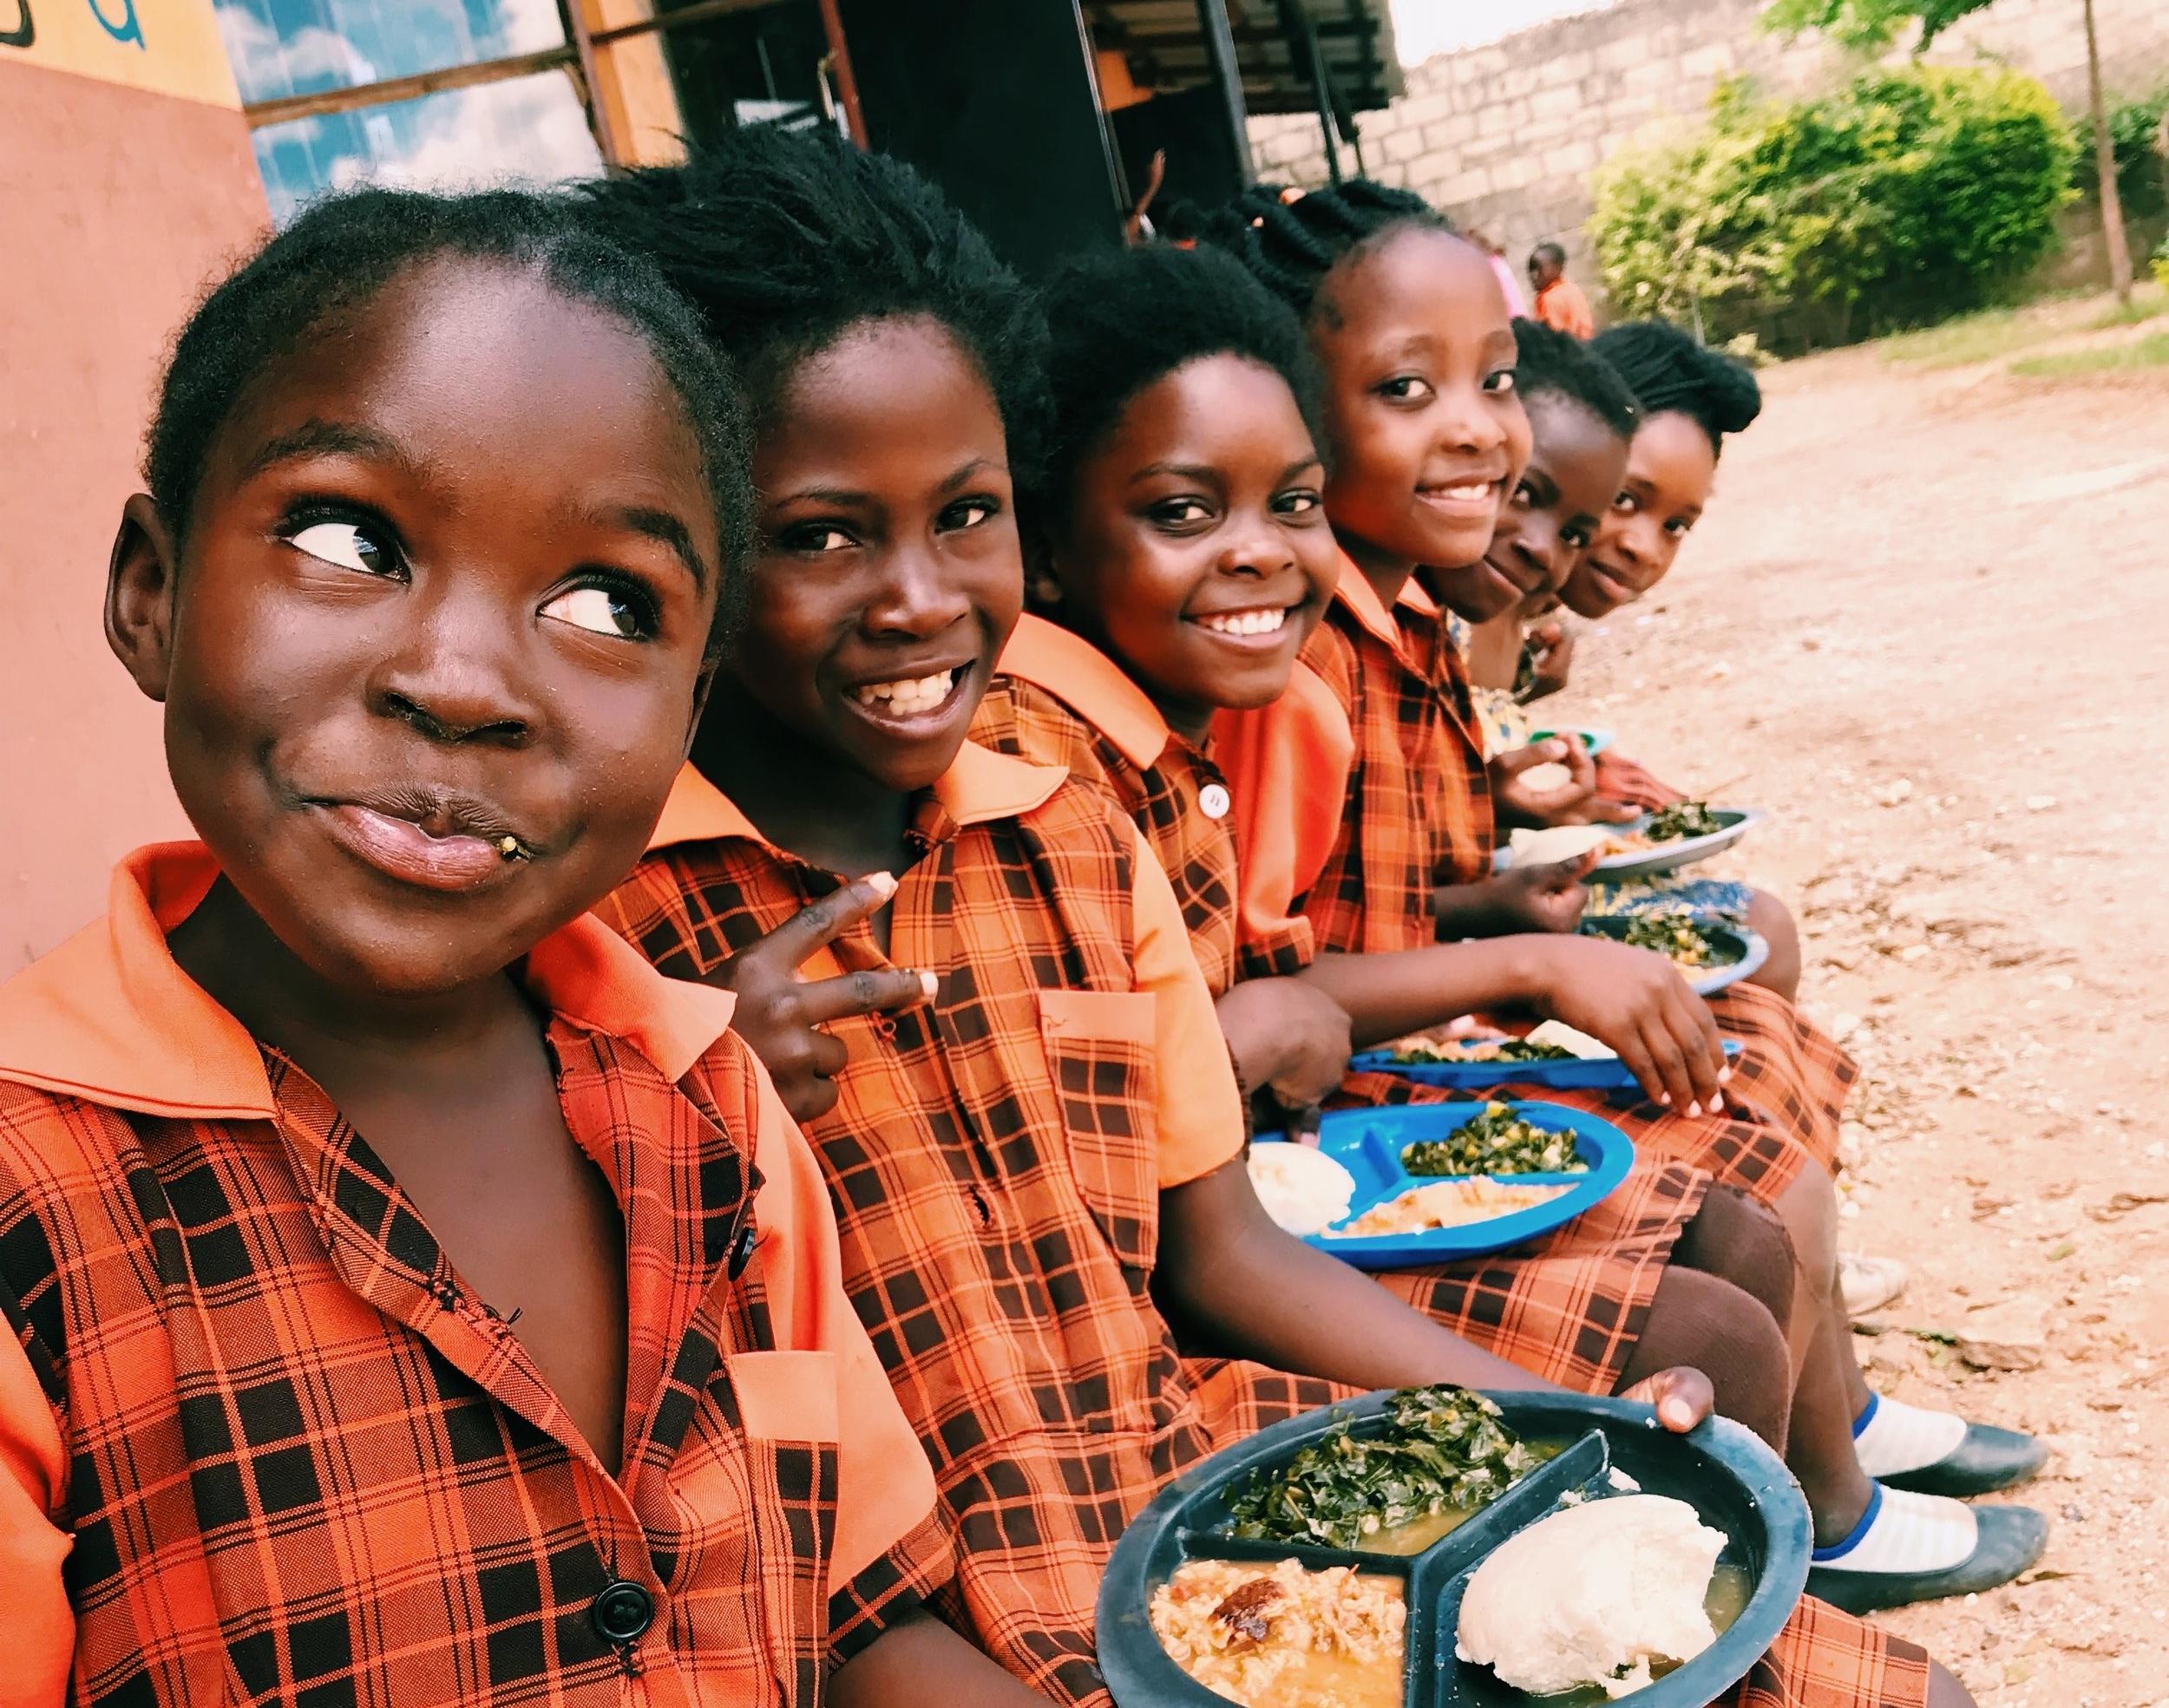 Students at Dotroda School